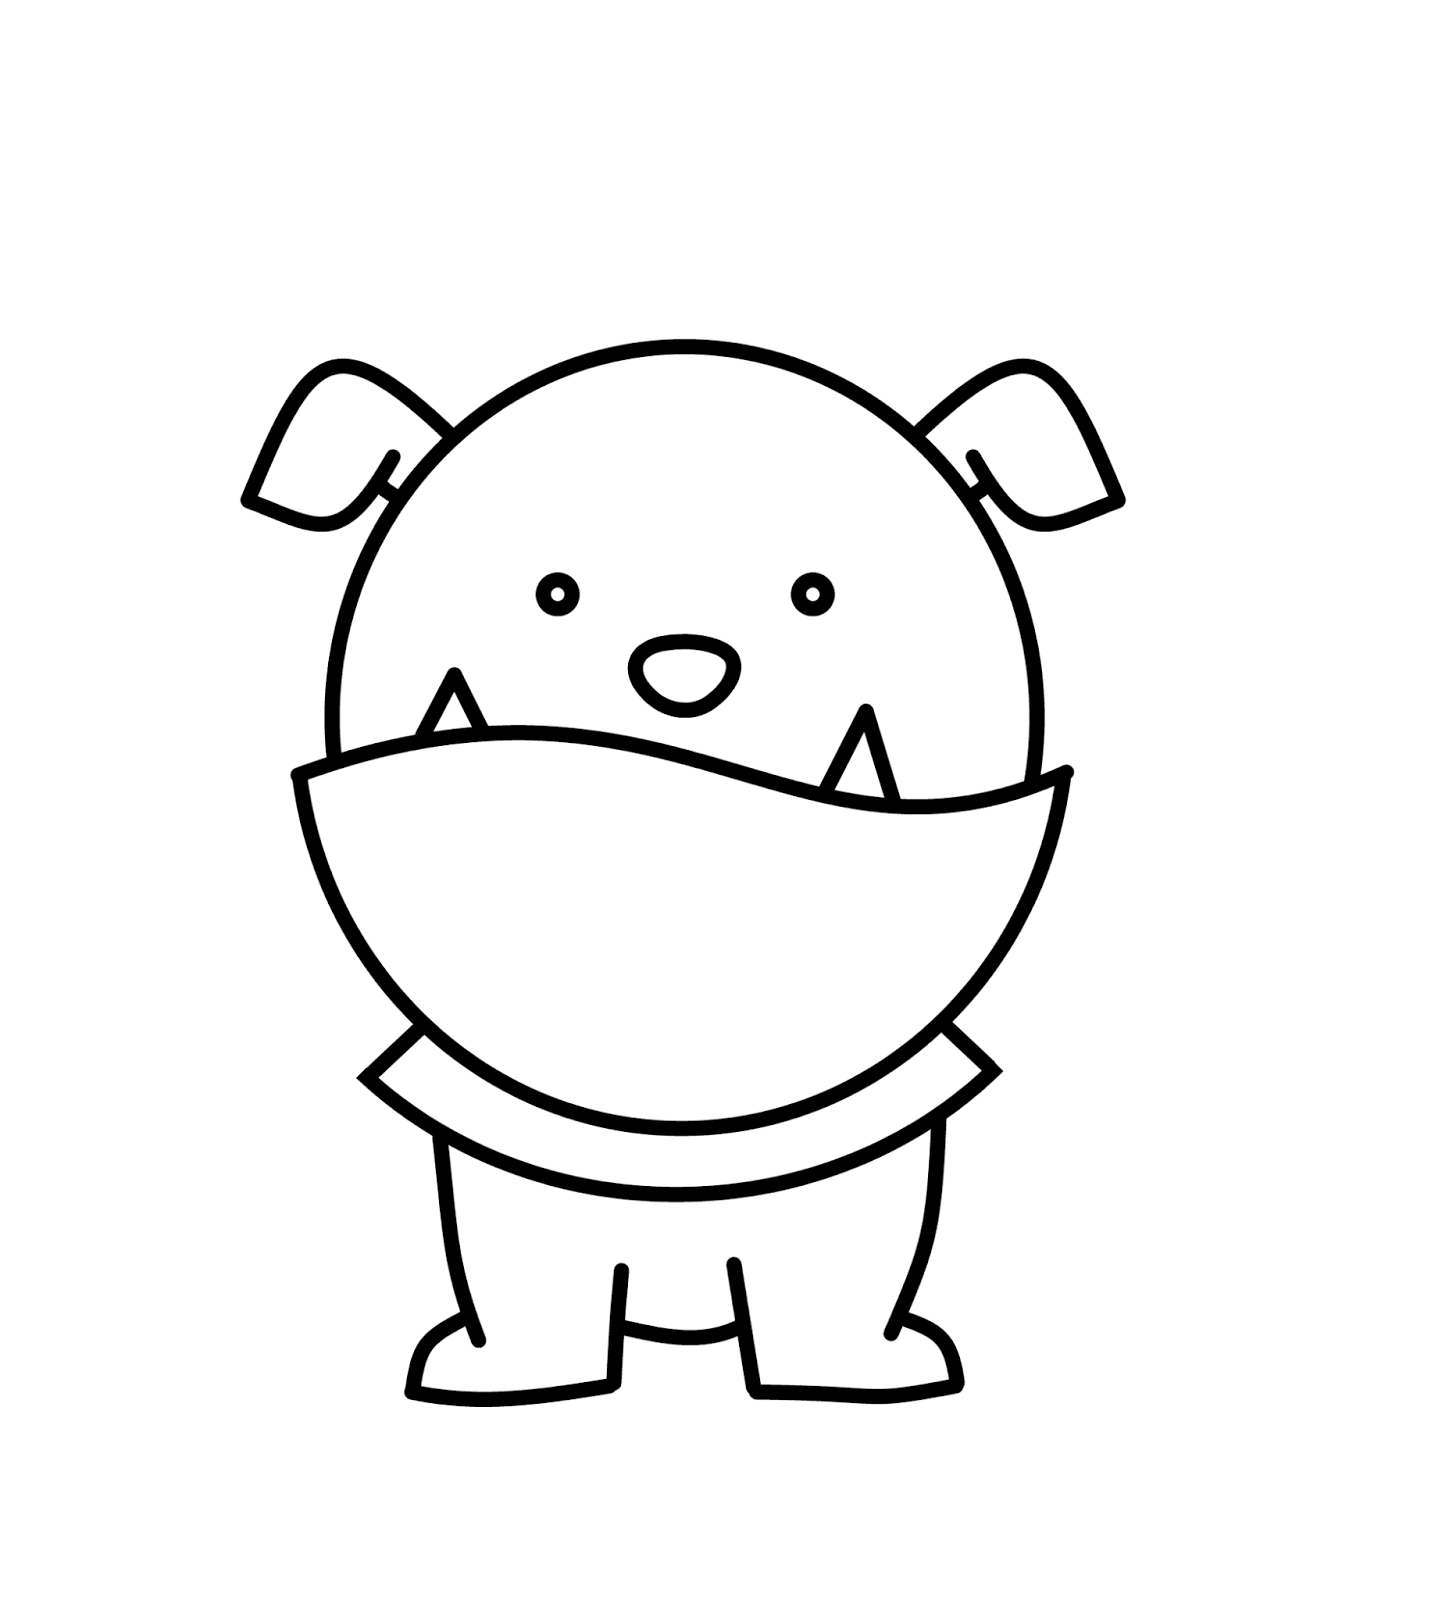 1449x1600 How To Draw Cartoons English Bulldog